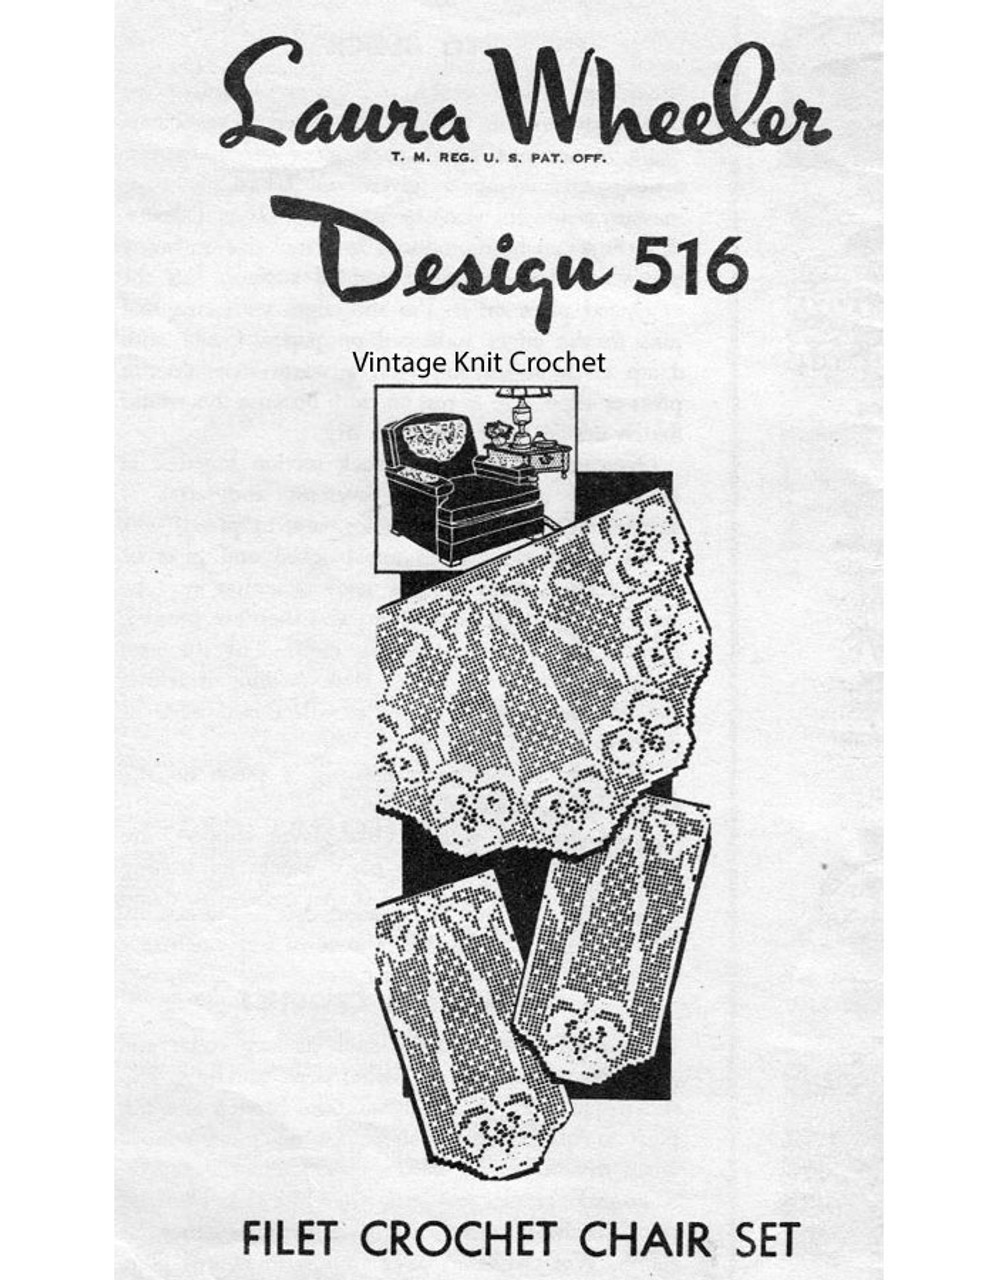 Pansy Filet Crochet Pattern, Chair Set, Design 516